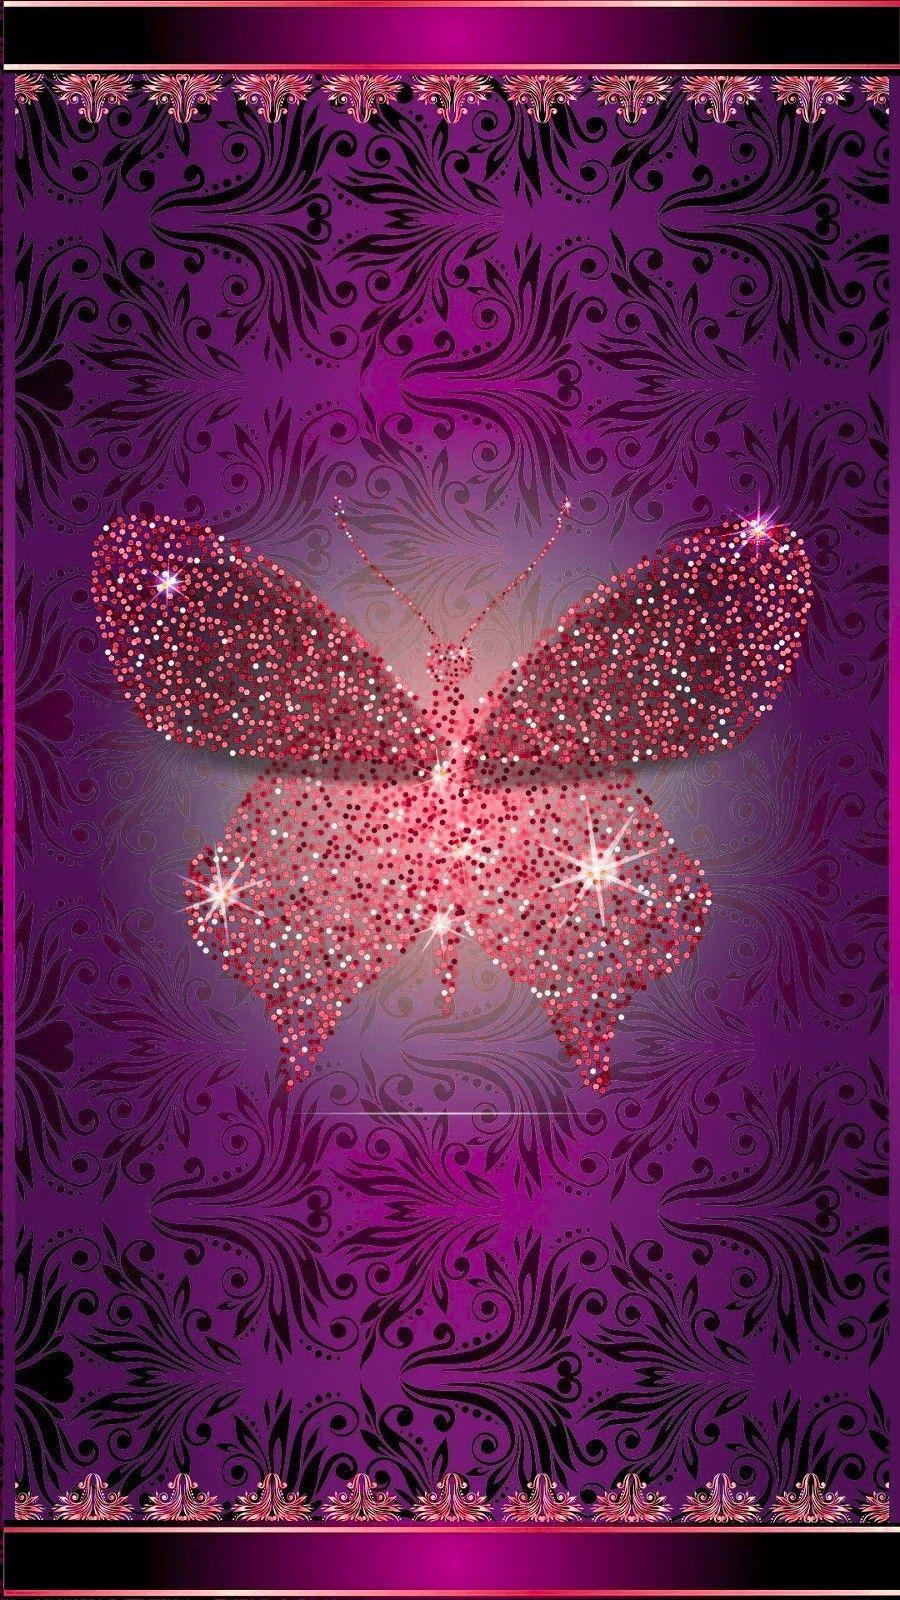 Pin by Nicole Budka on Glitter Backgrounds | Butterfly ...